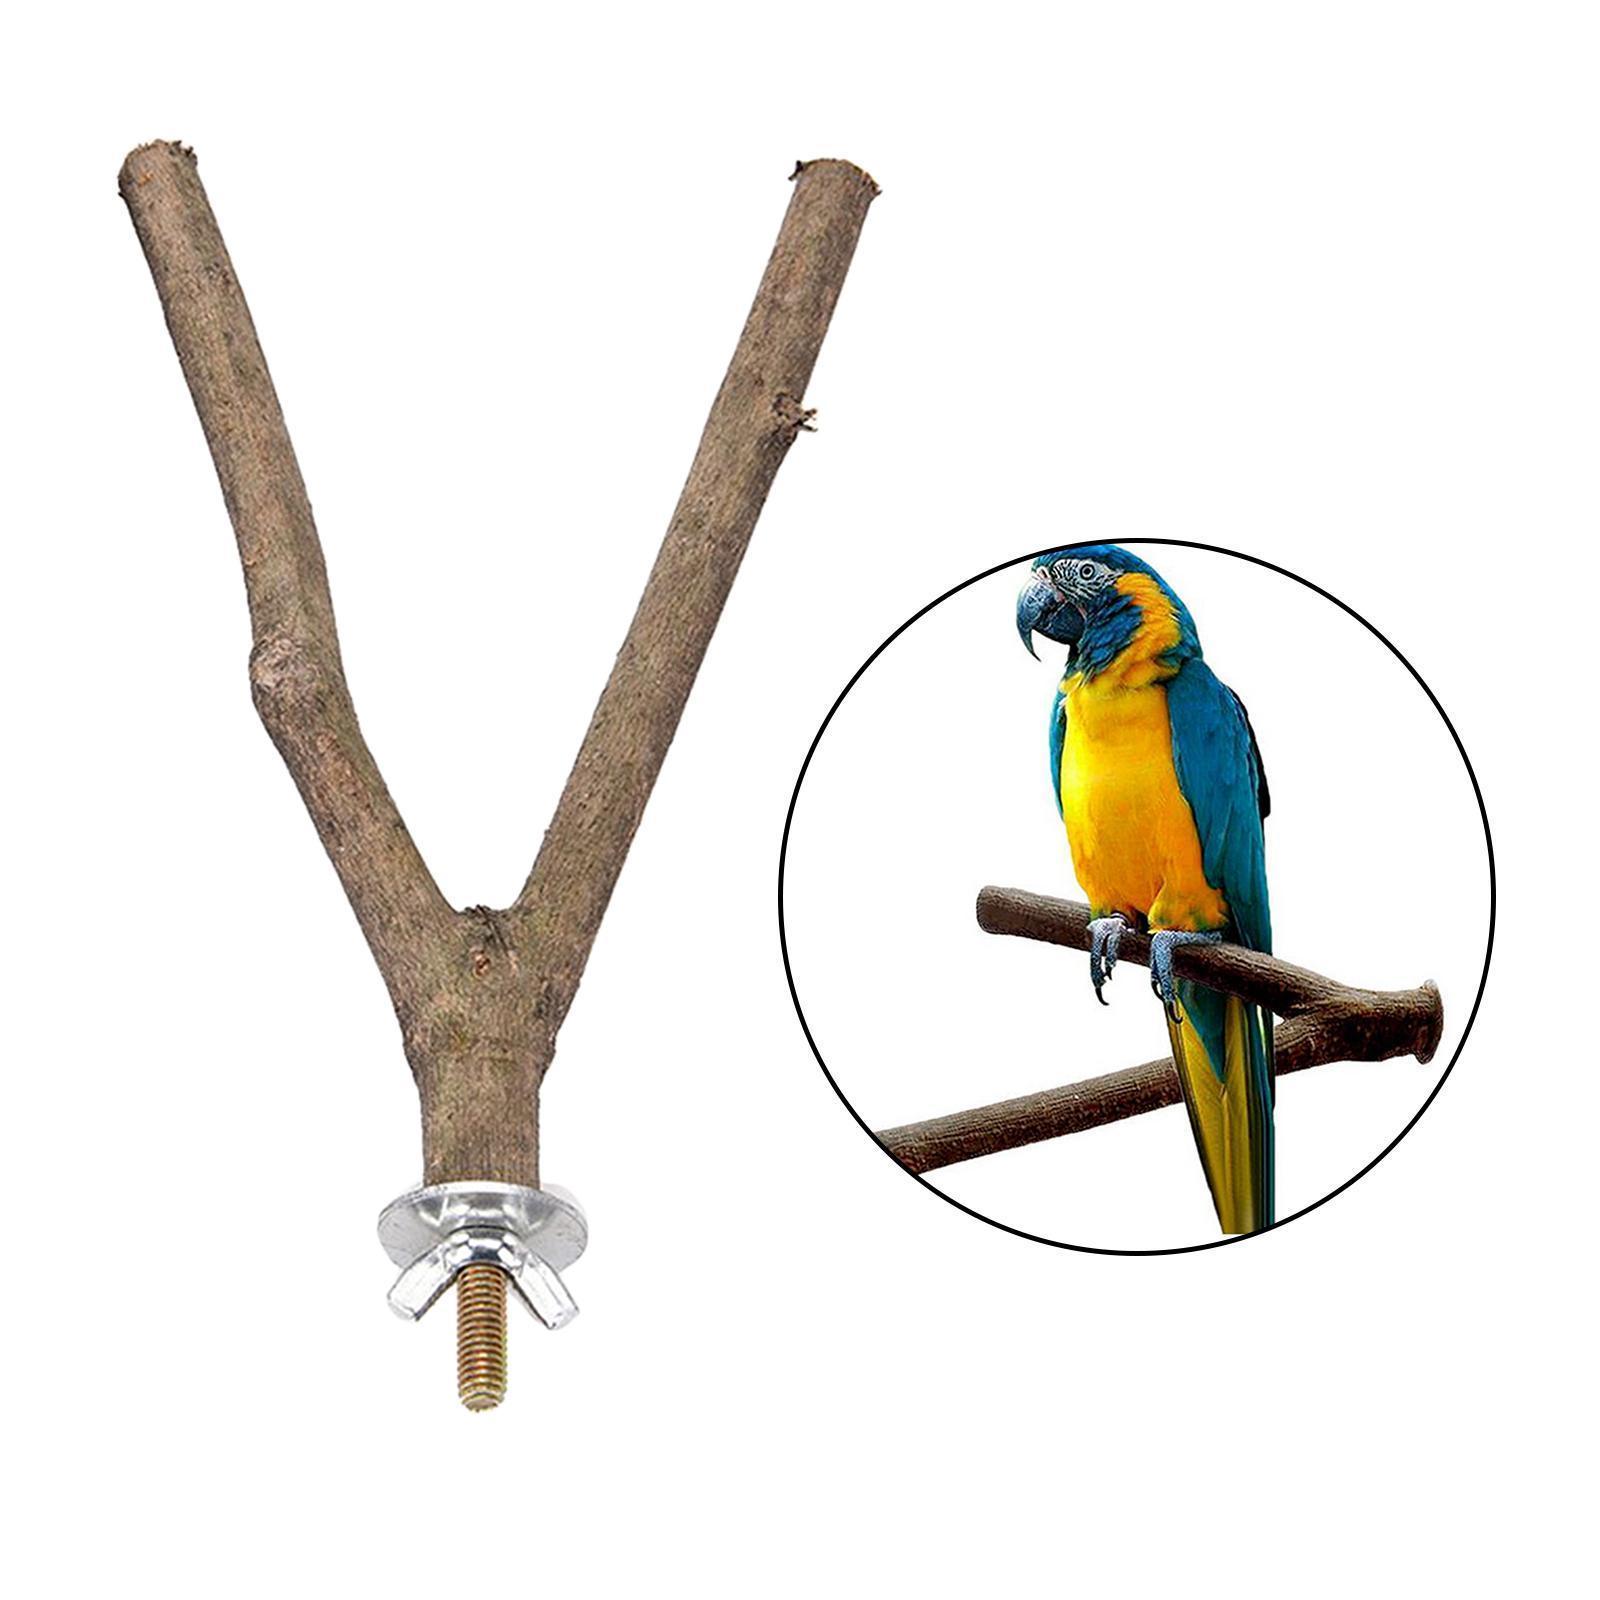 thumbnail 40 - Bird-Perch-Wood-Stand-Bird-Cage-Swing-Branch-for-Parrot-Parakeet-Cockatiel